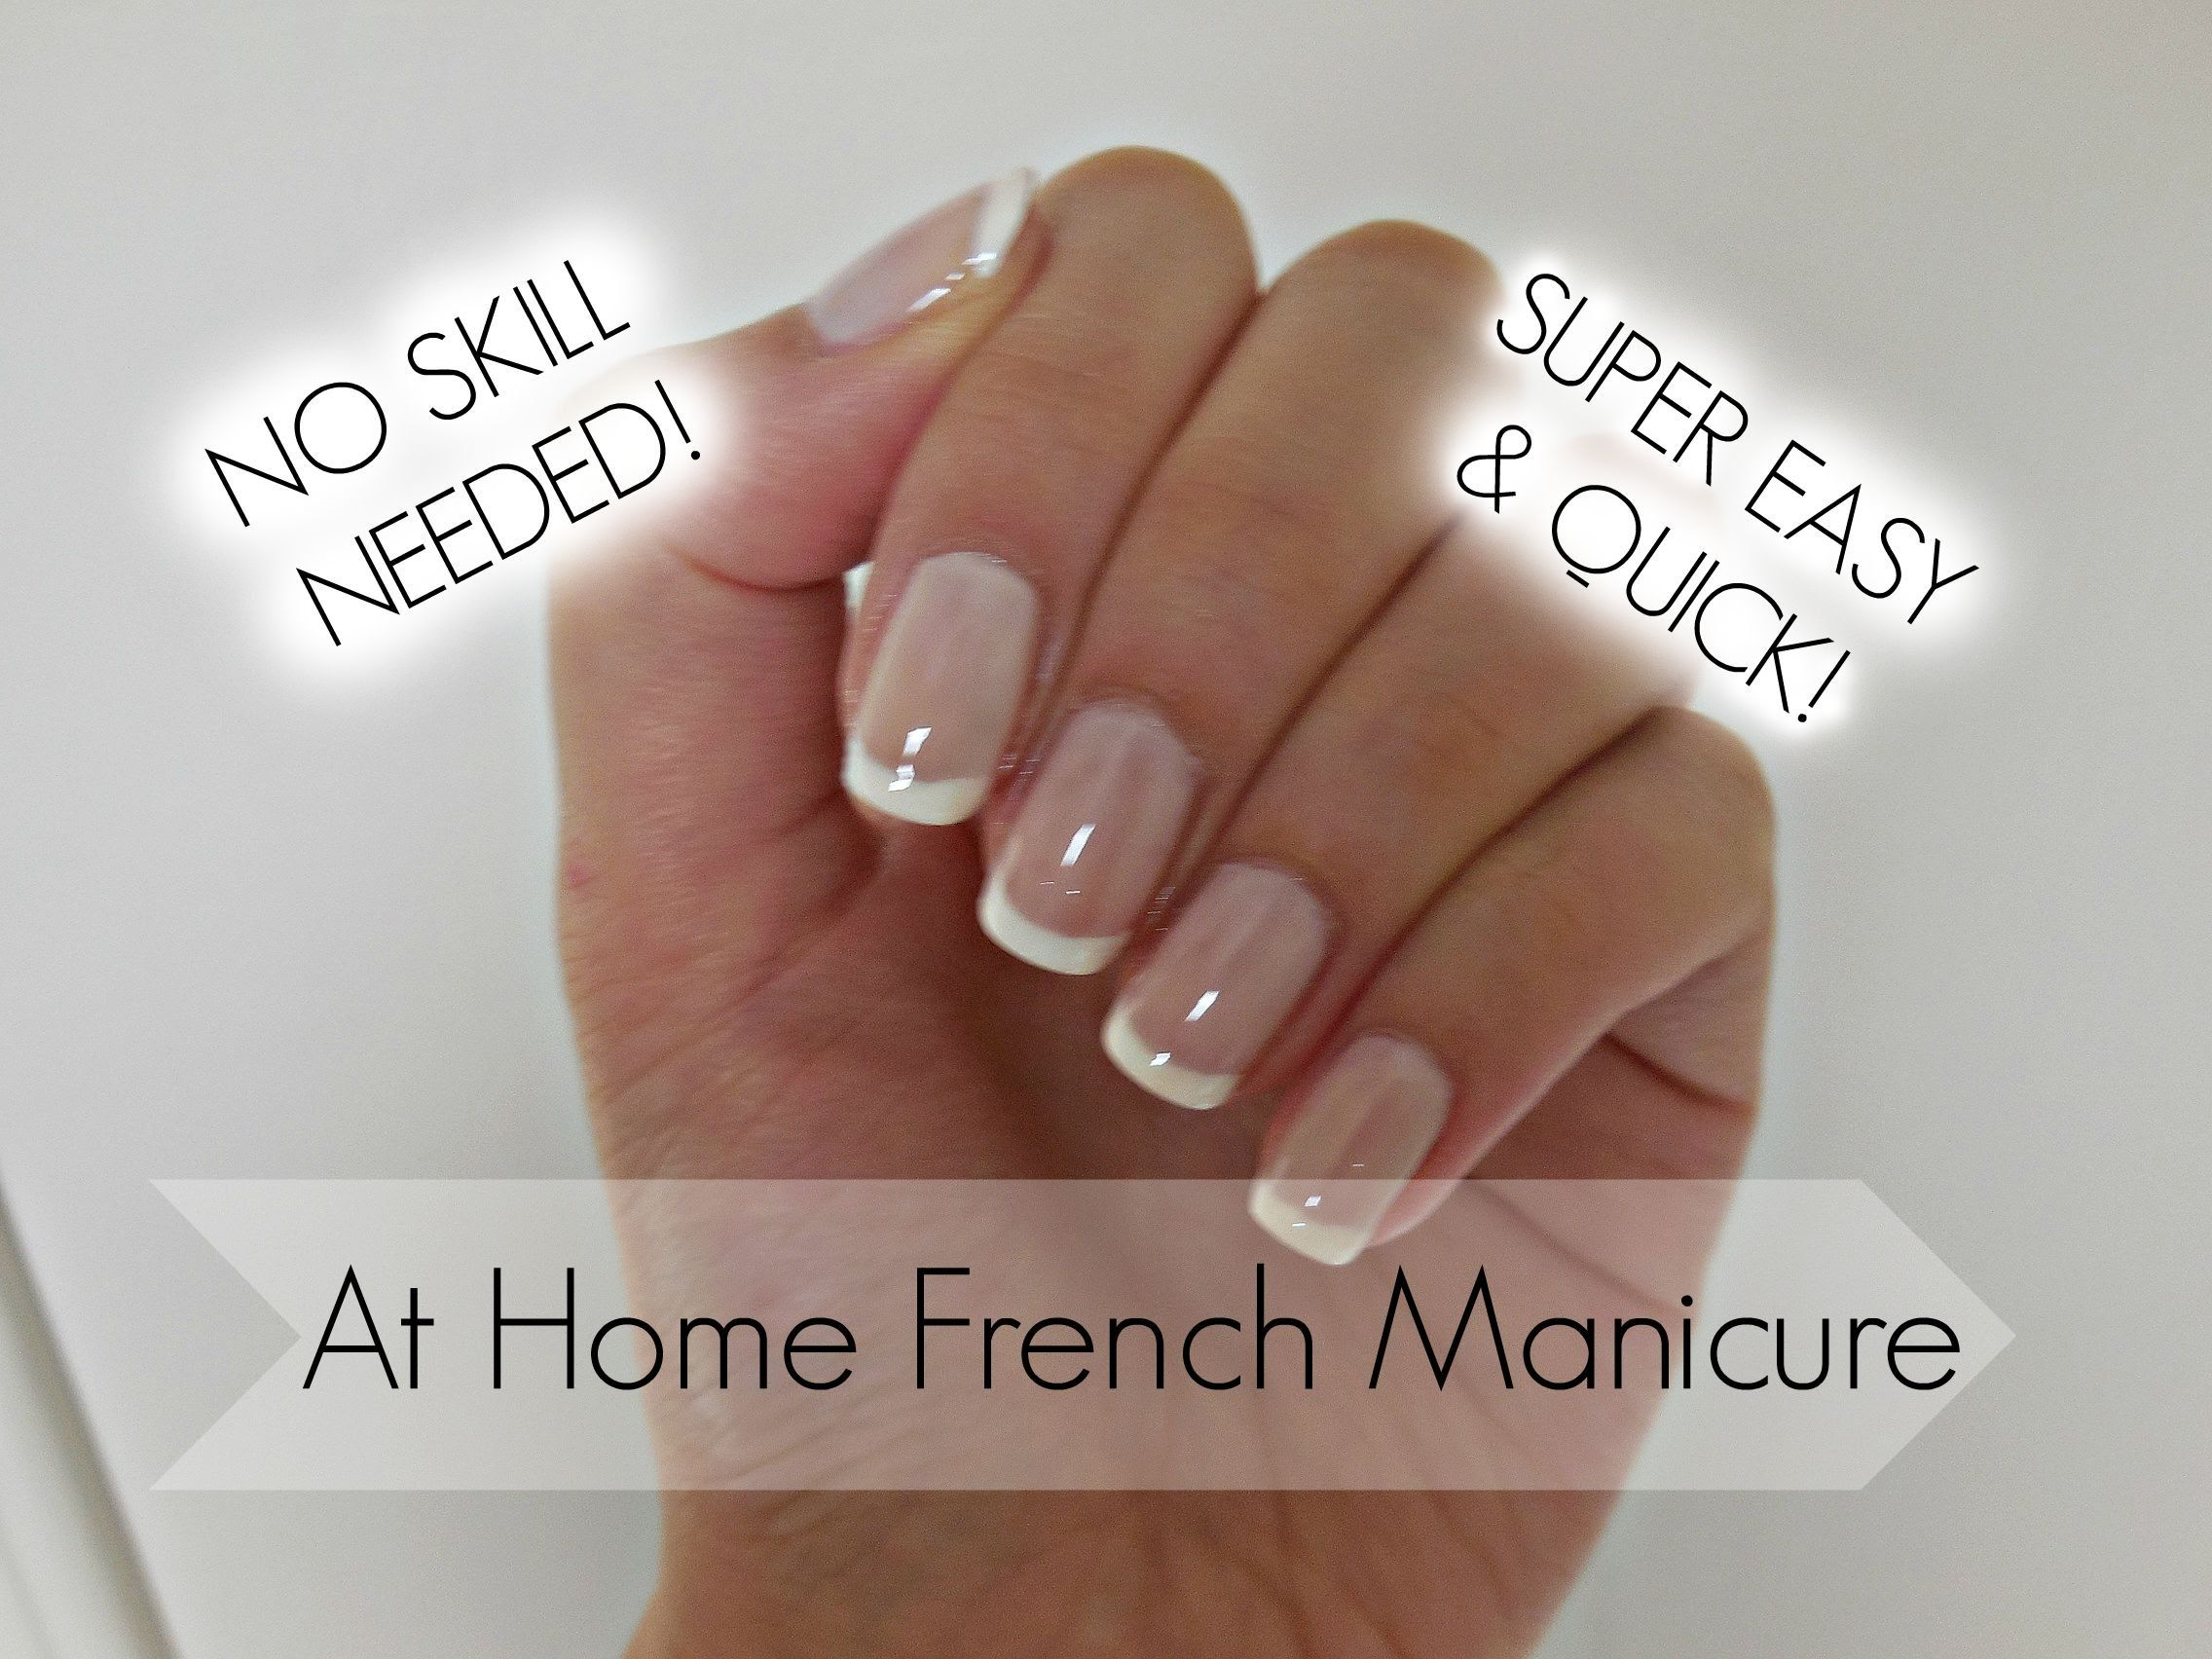 How To Make French Nail Art At Home